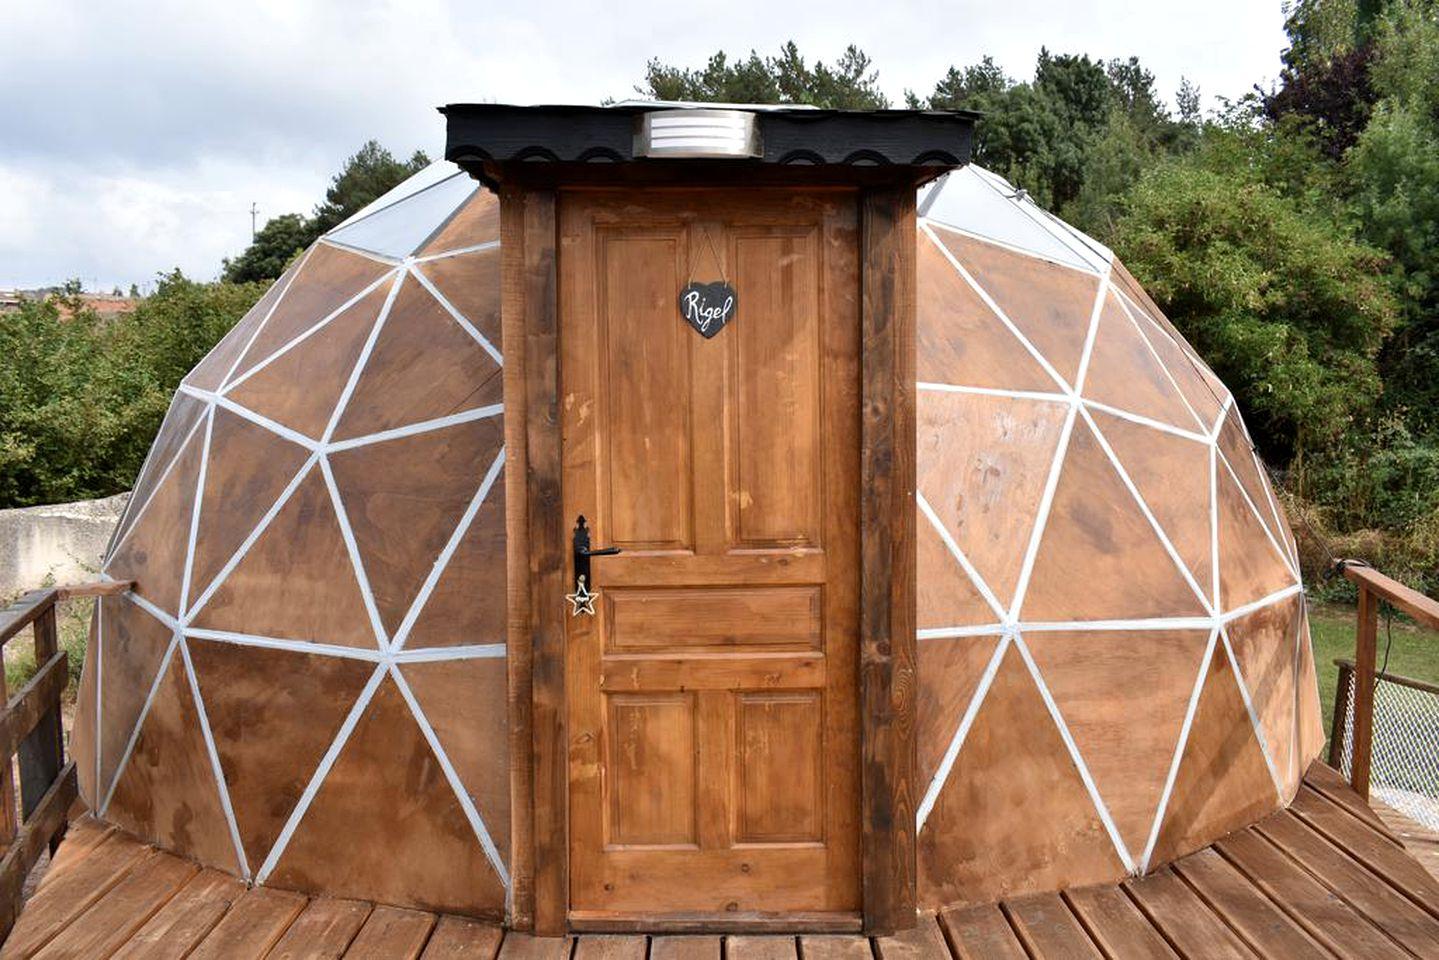 Bubbles & Domes (Tarragona, Catalonia, Spain)